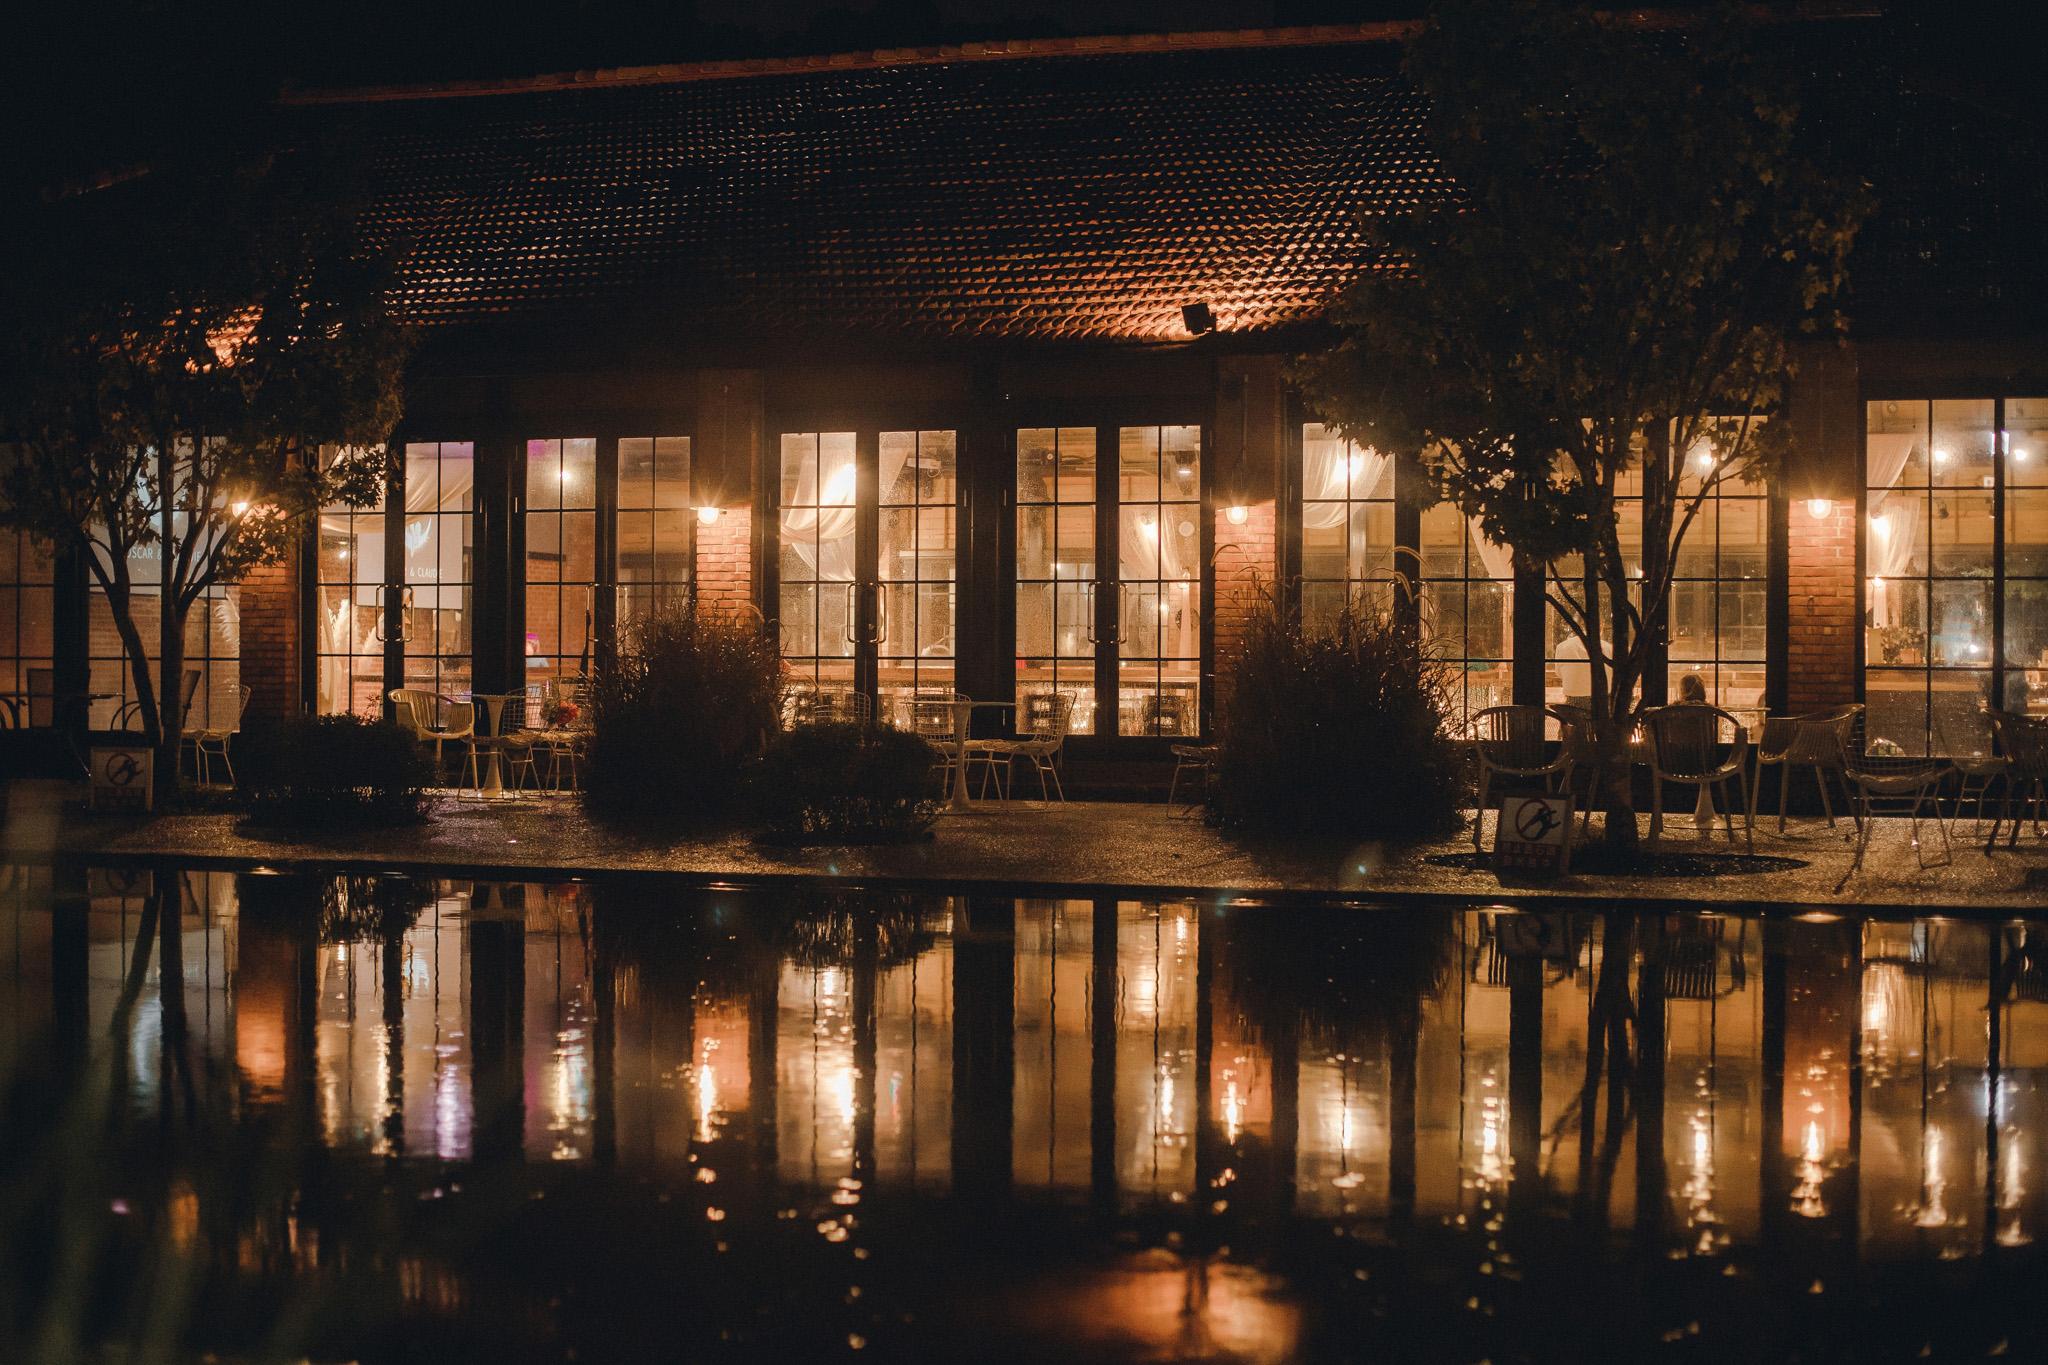 EW 台北婚攝 居米 濟南教會 Brick Yard 33 美軍俱樂部 婚禮 婚宴-67